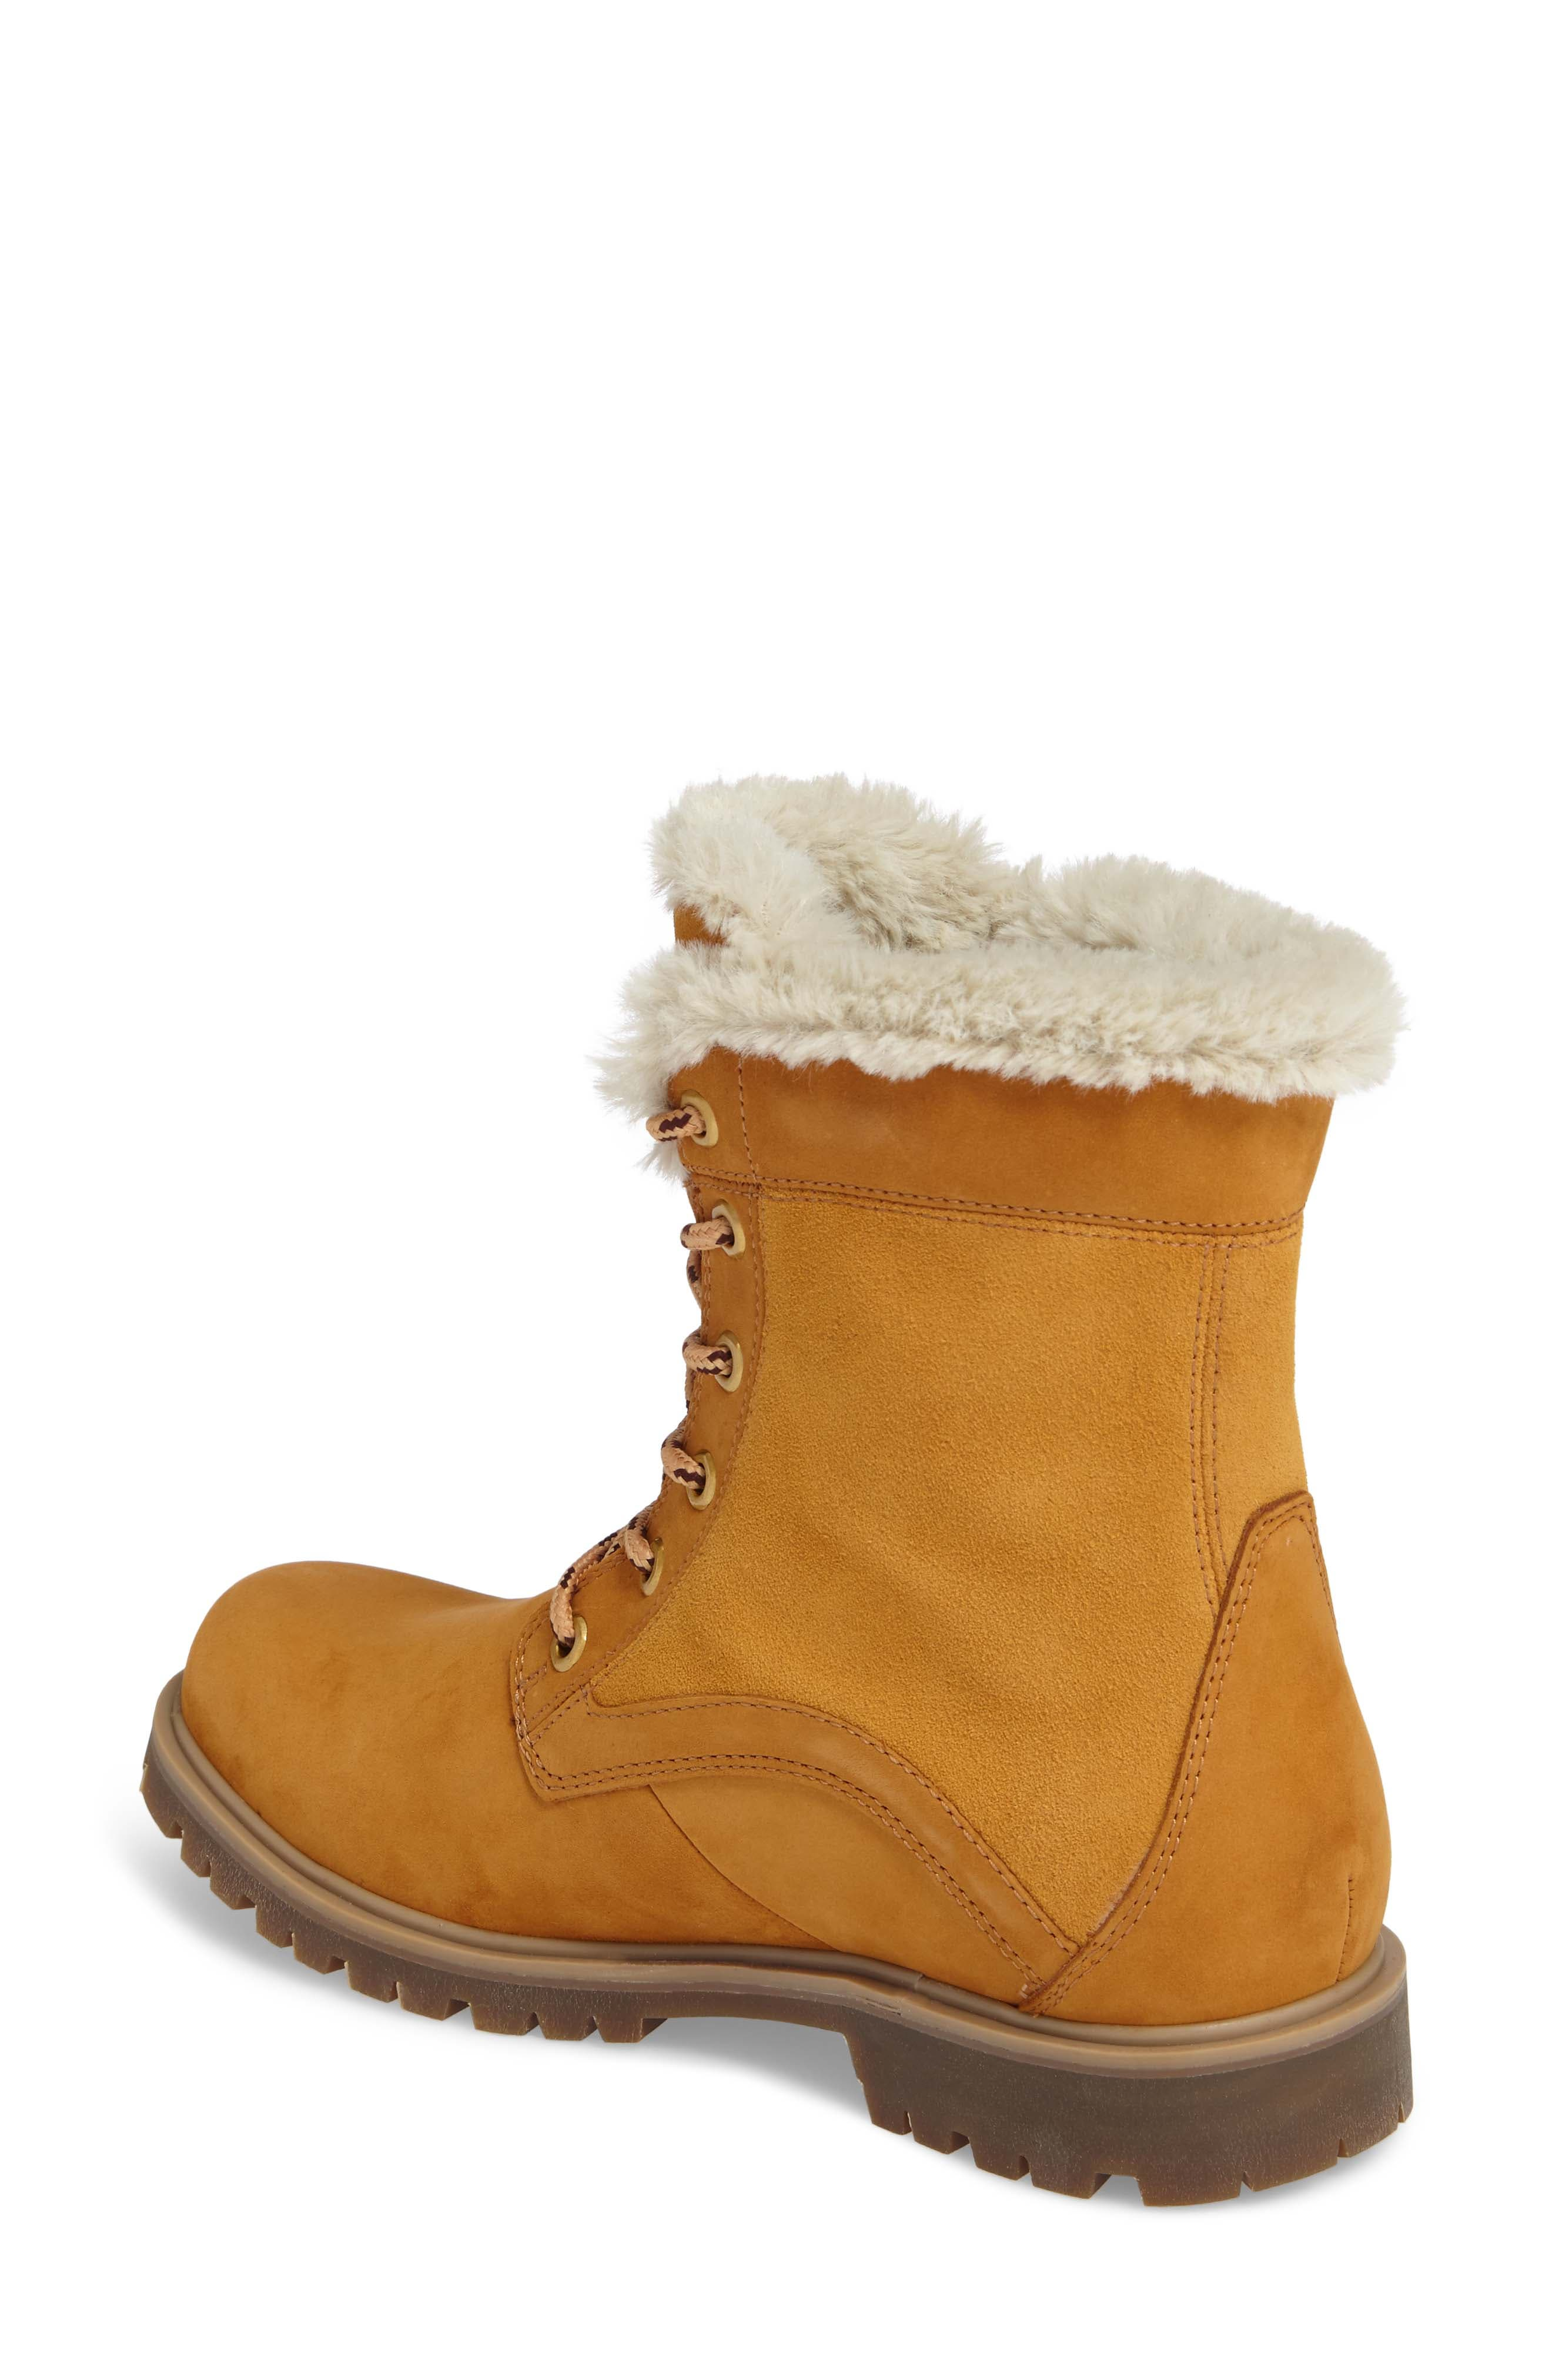 Alternate Image 2  - Helly Hansen Marion Waterproof Winter Boot (Women)